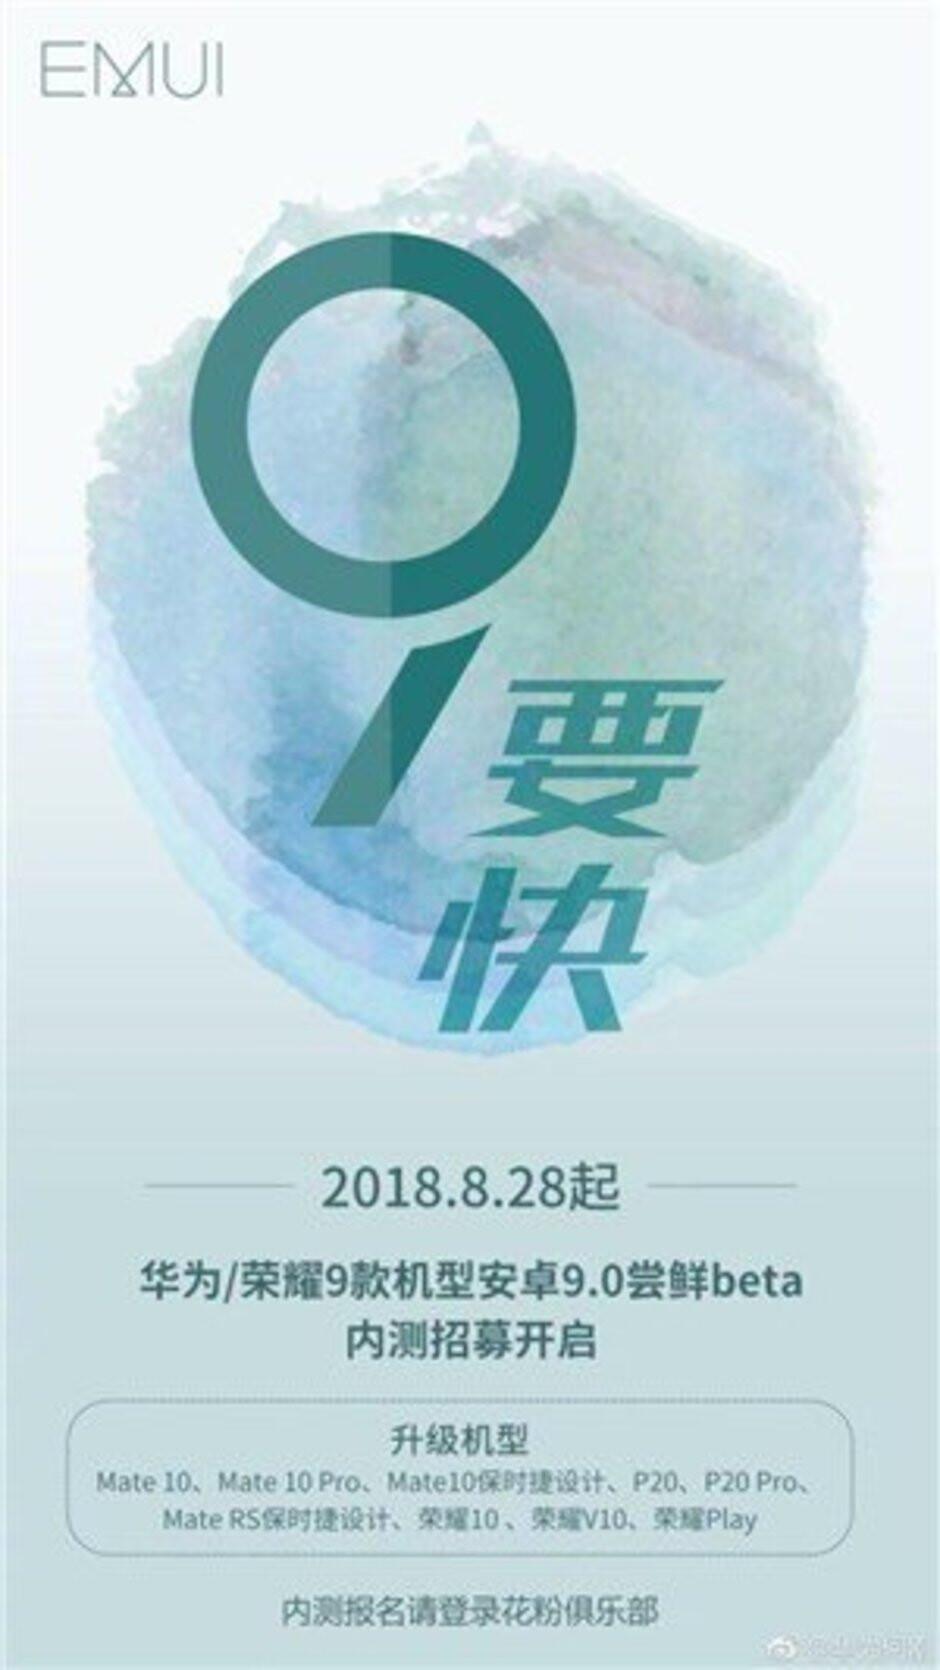 Huawei debuts Android 9 Pie beta program for 9 smartphones